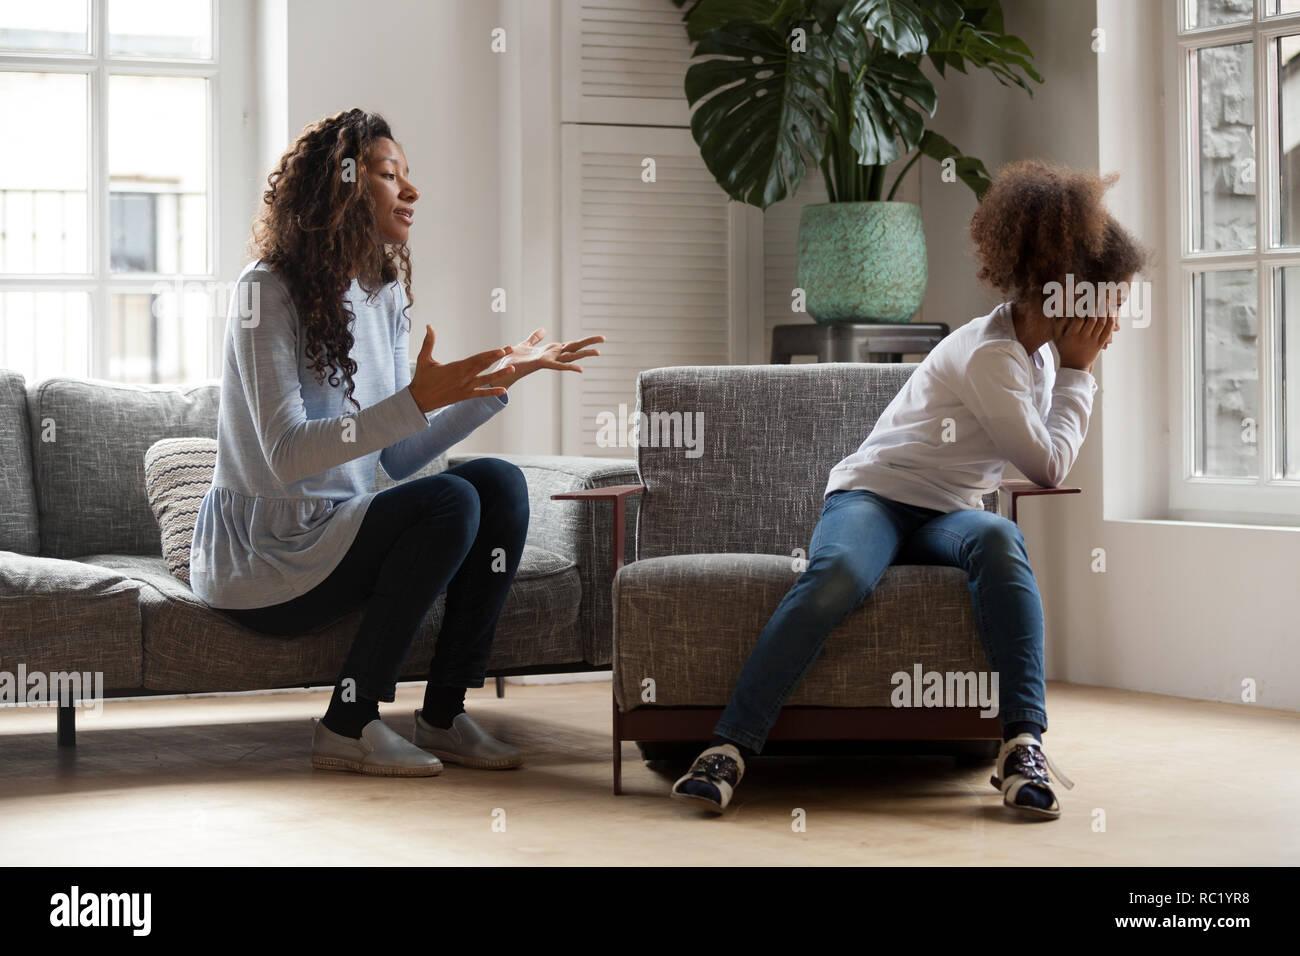 Stubborn african kid ignoring mom scolding, parent and child con - Stock Image